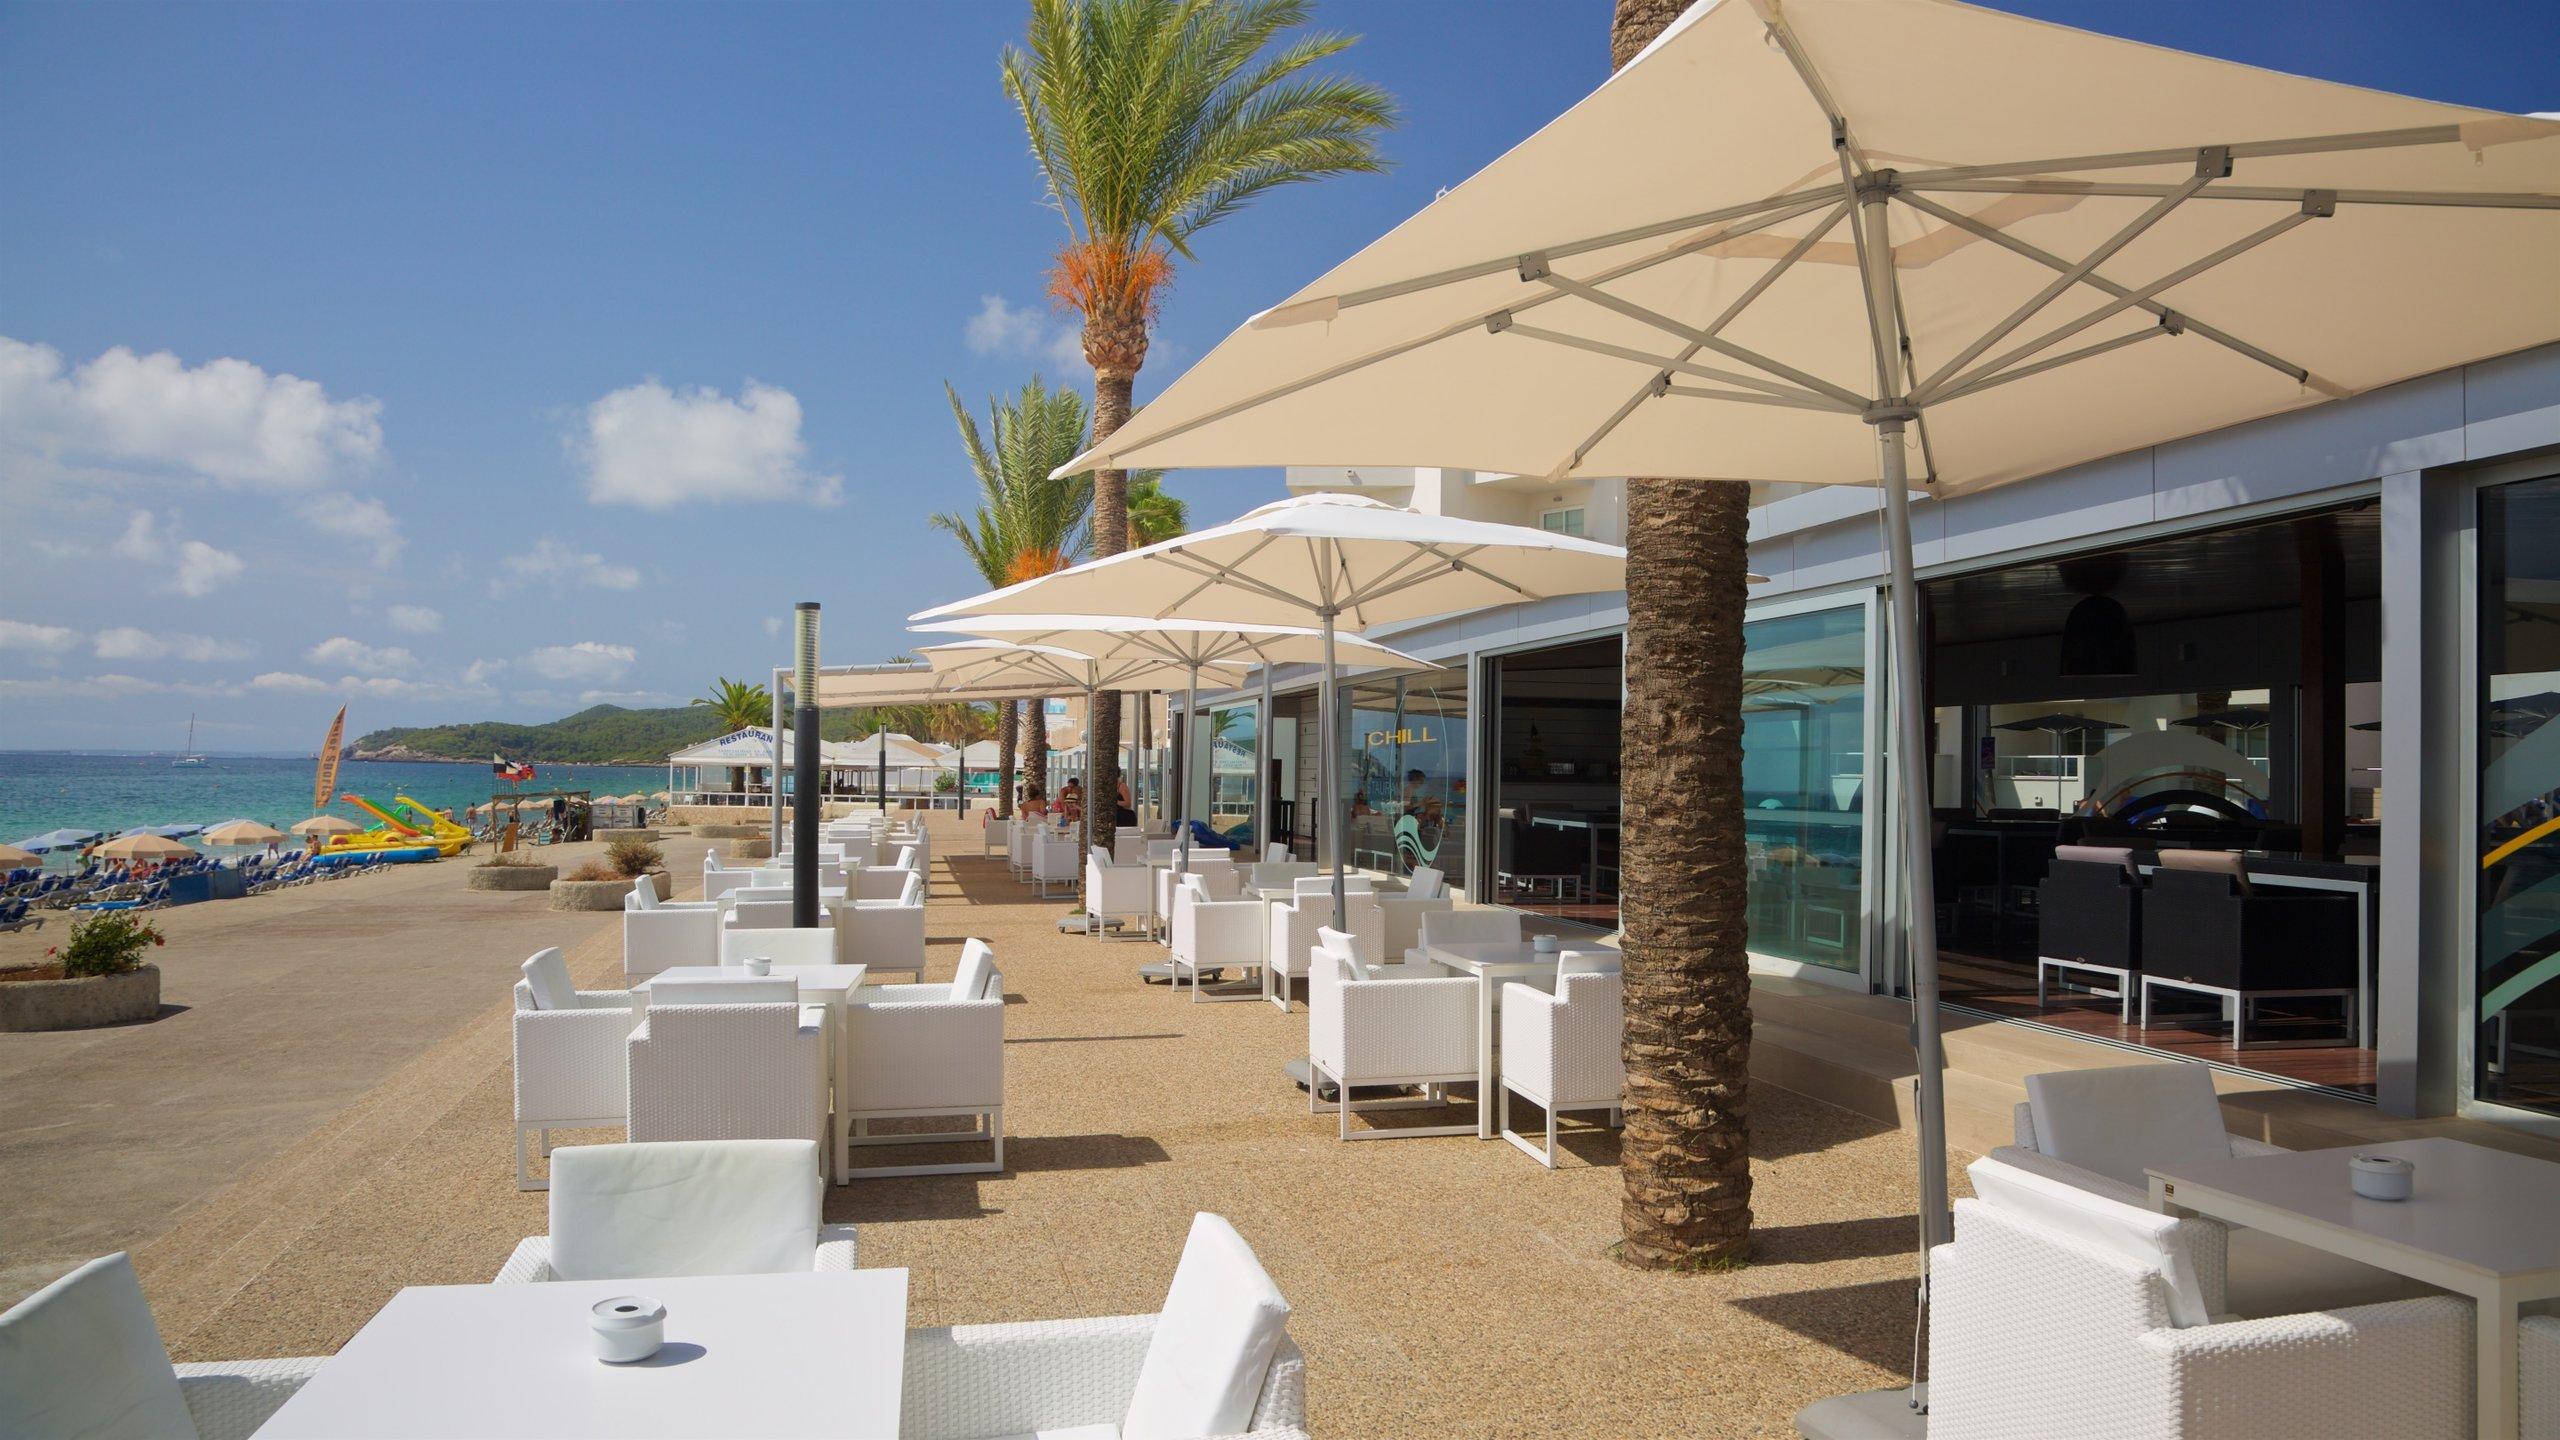 56e3366009 Playa d'en Bossa Accommodation - Top Playa d'en Bossa Hotels 2019   Wotif